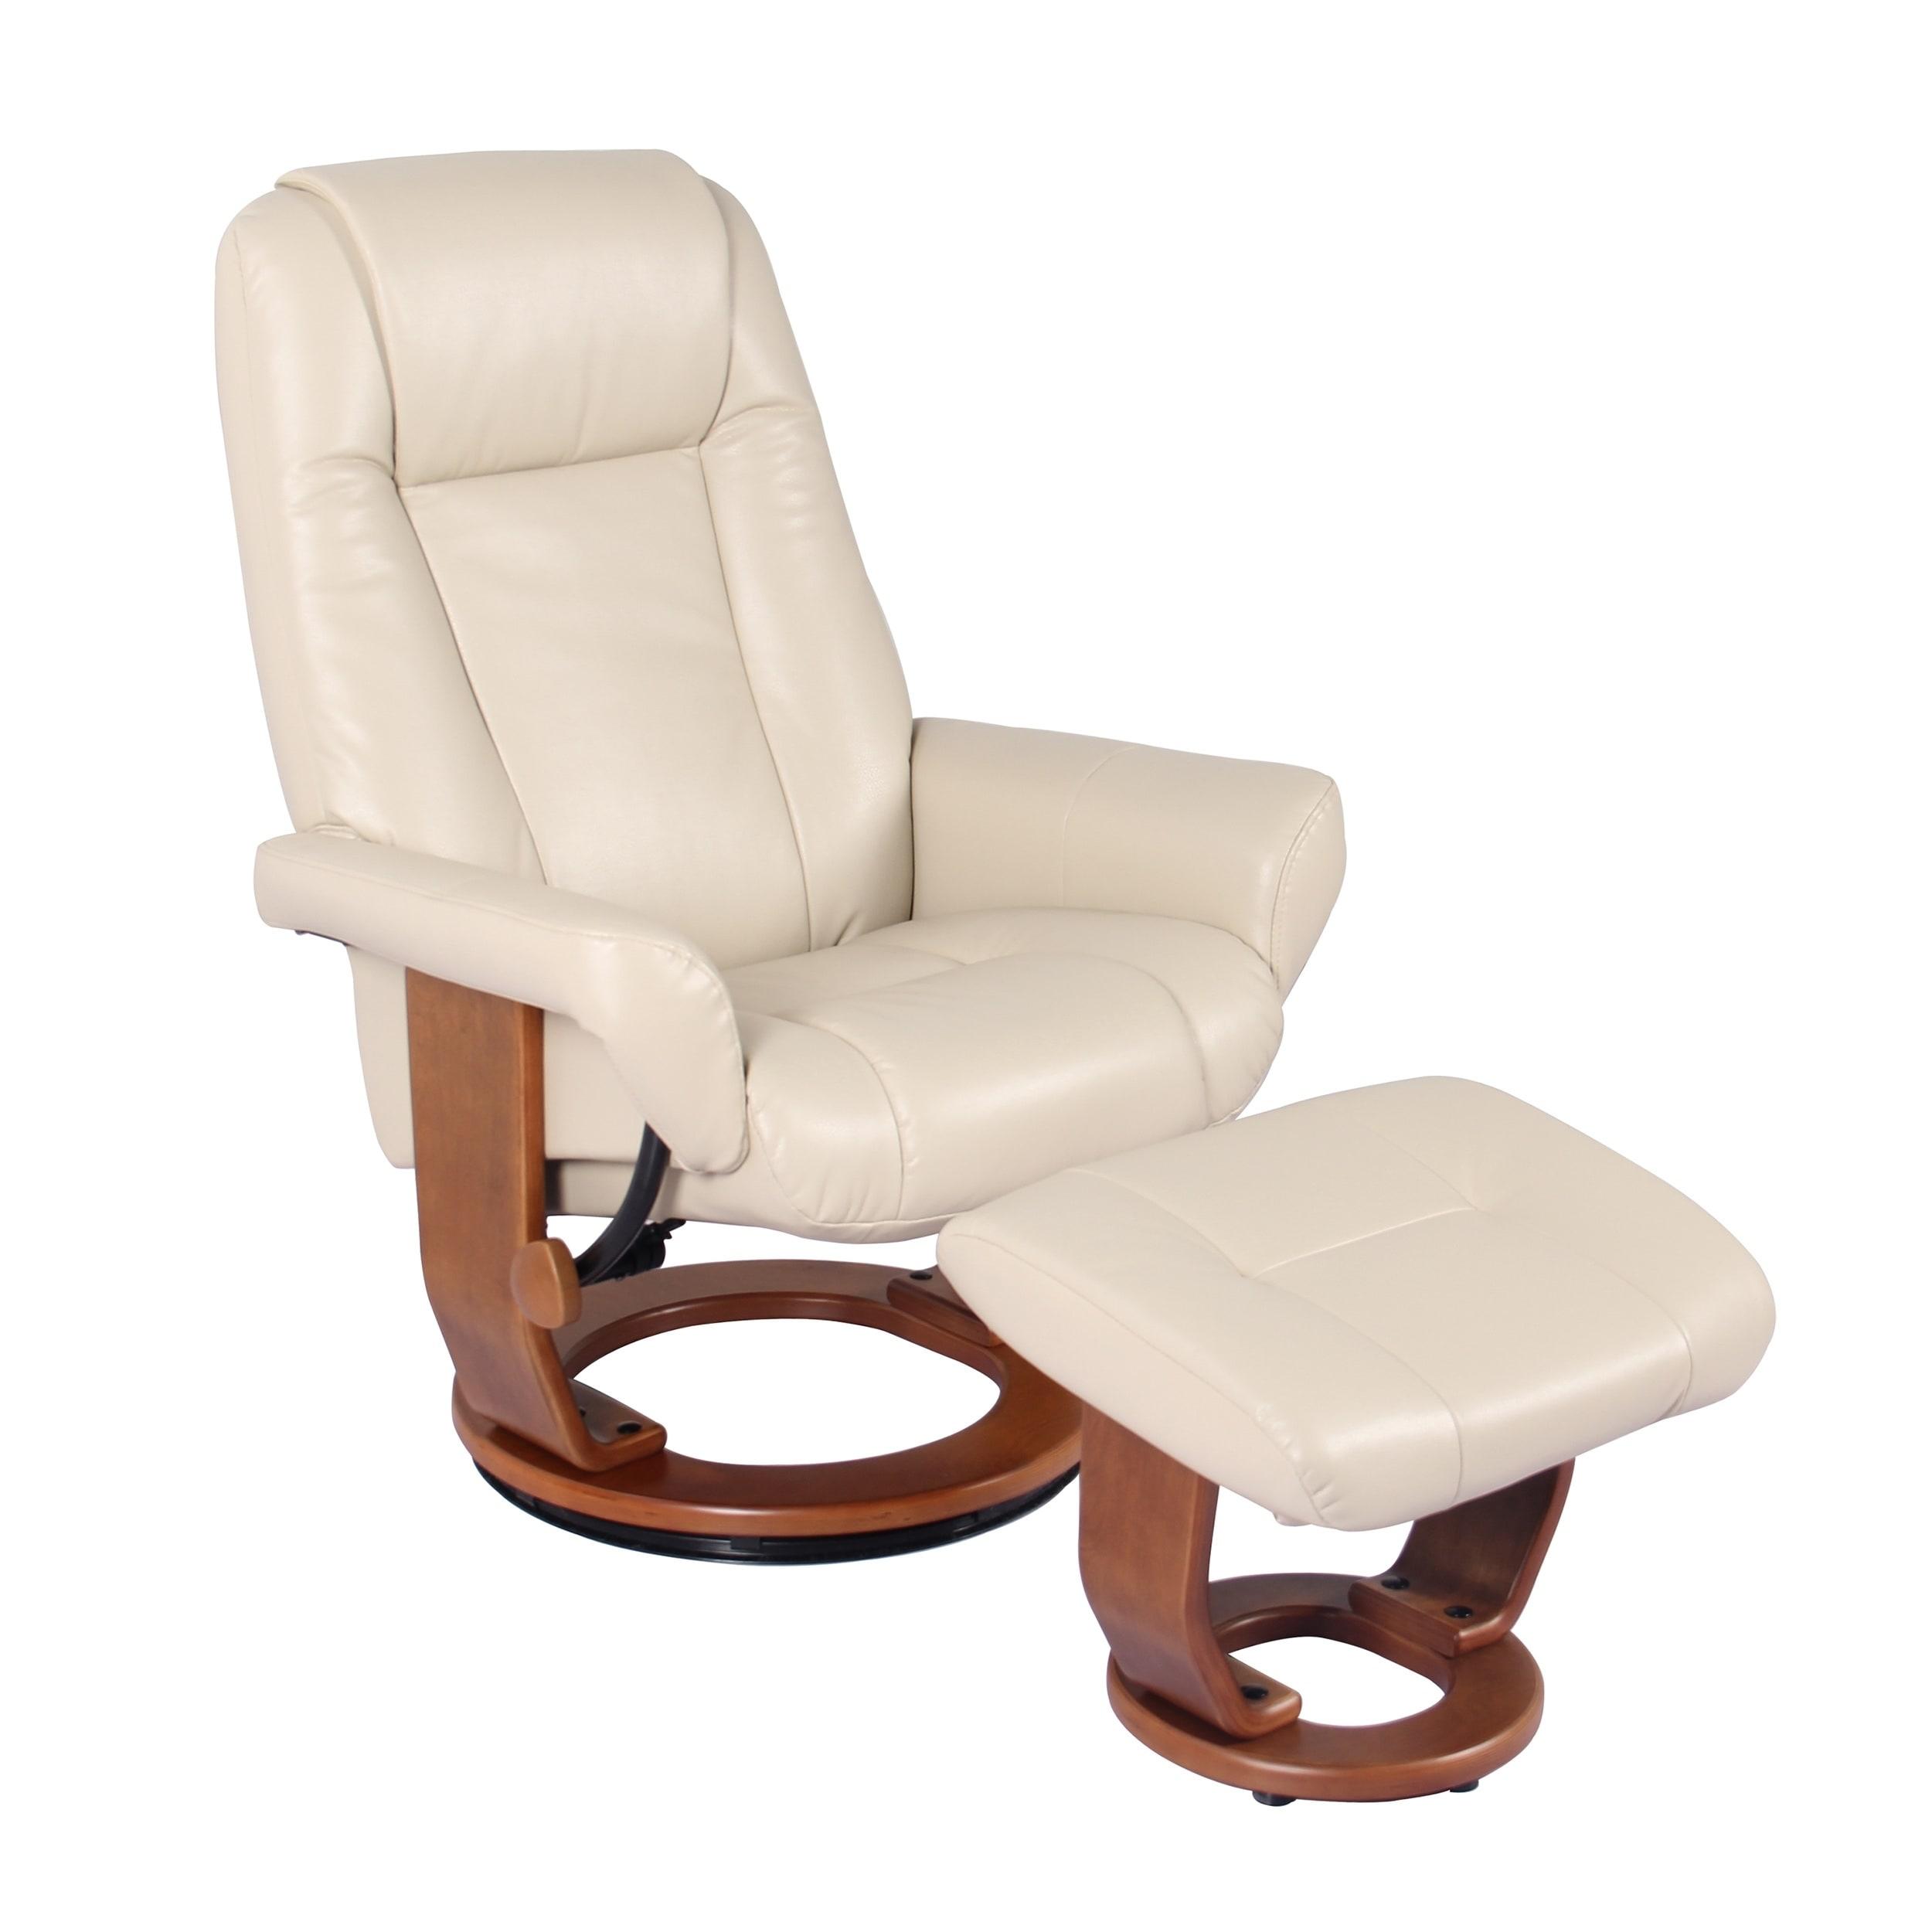 Shop New Ridge Home Swivel Recliner Chair U0026 Ottoman In Stucco, Havana    Free Shipping Today   Overstock.com   21609668